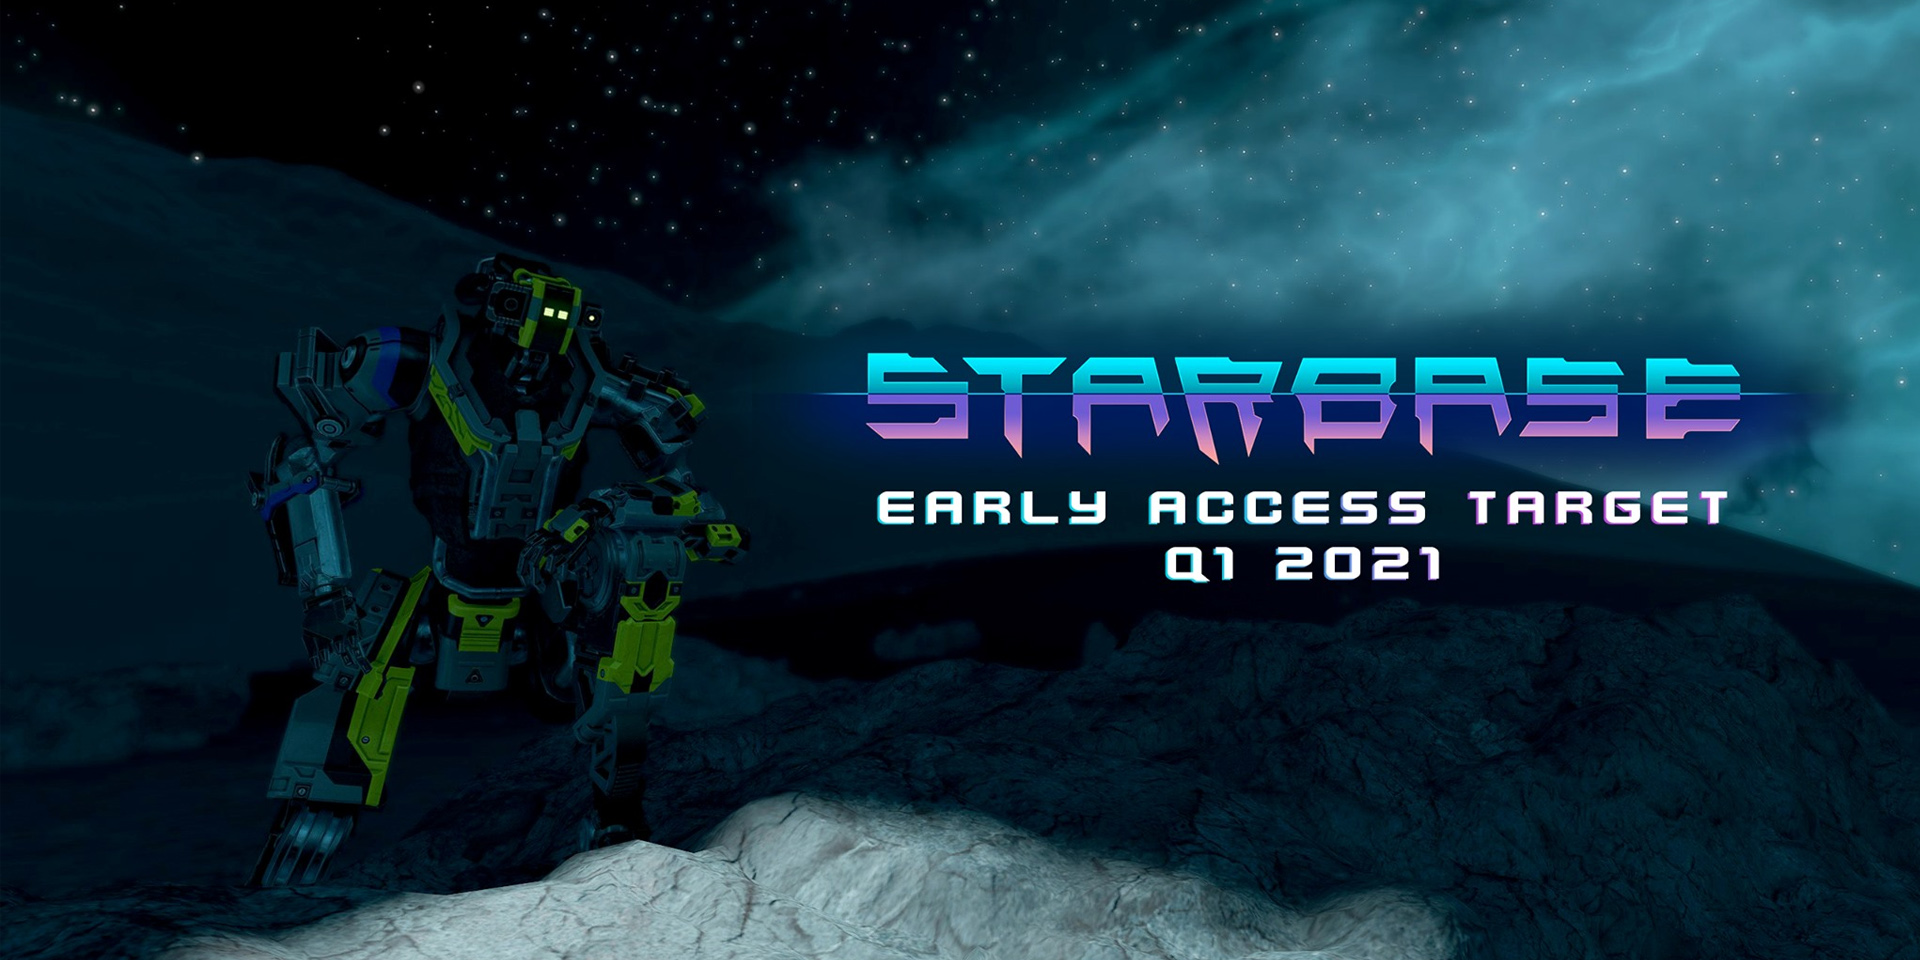 Starbase: Старт проекта в режиме